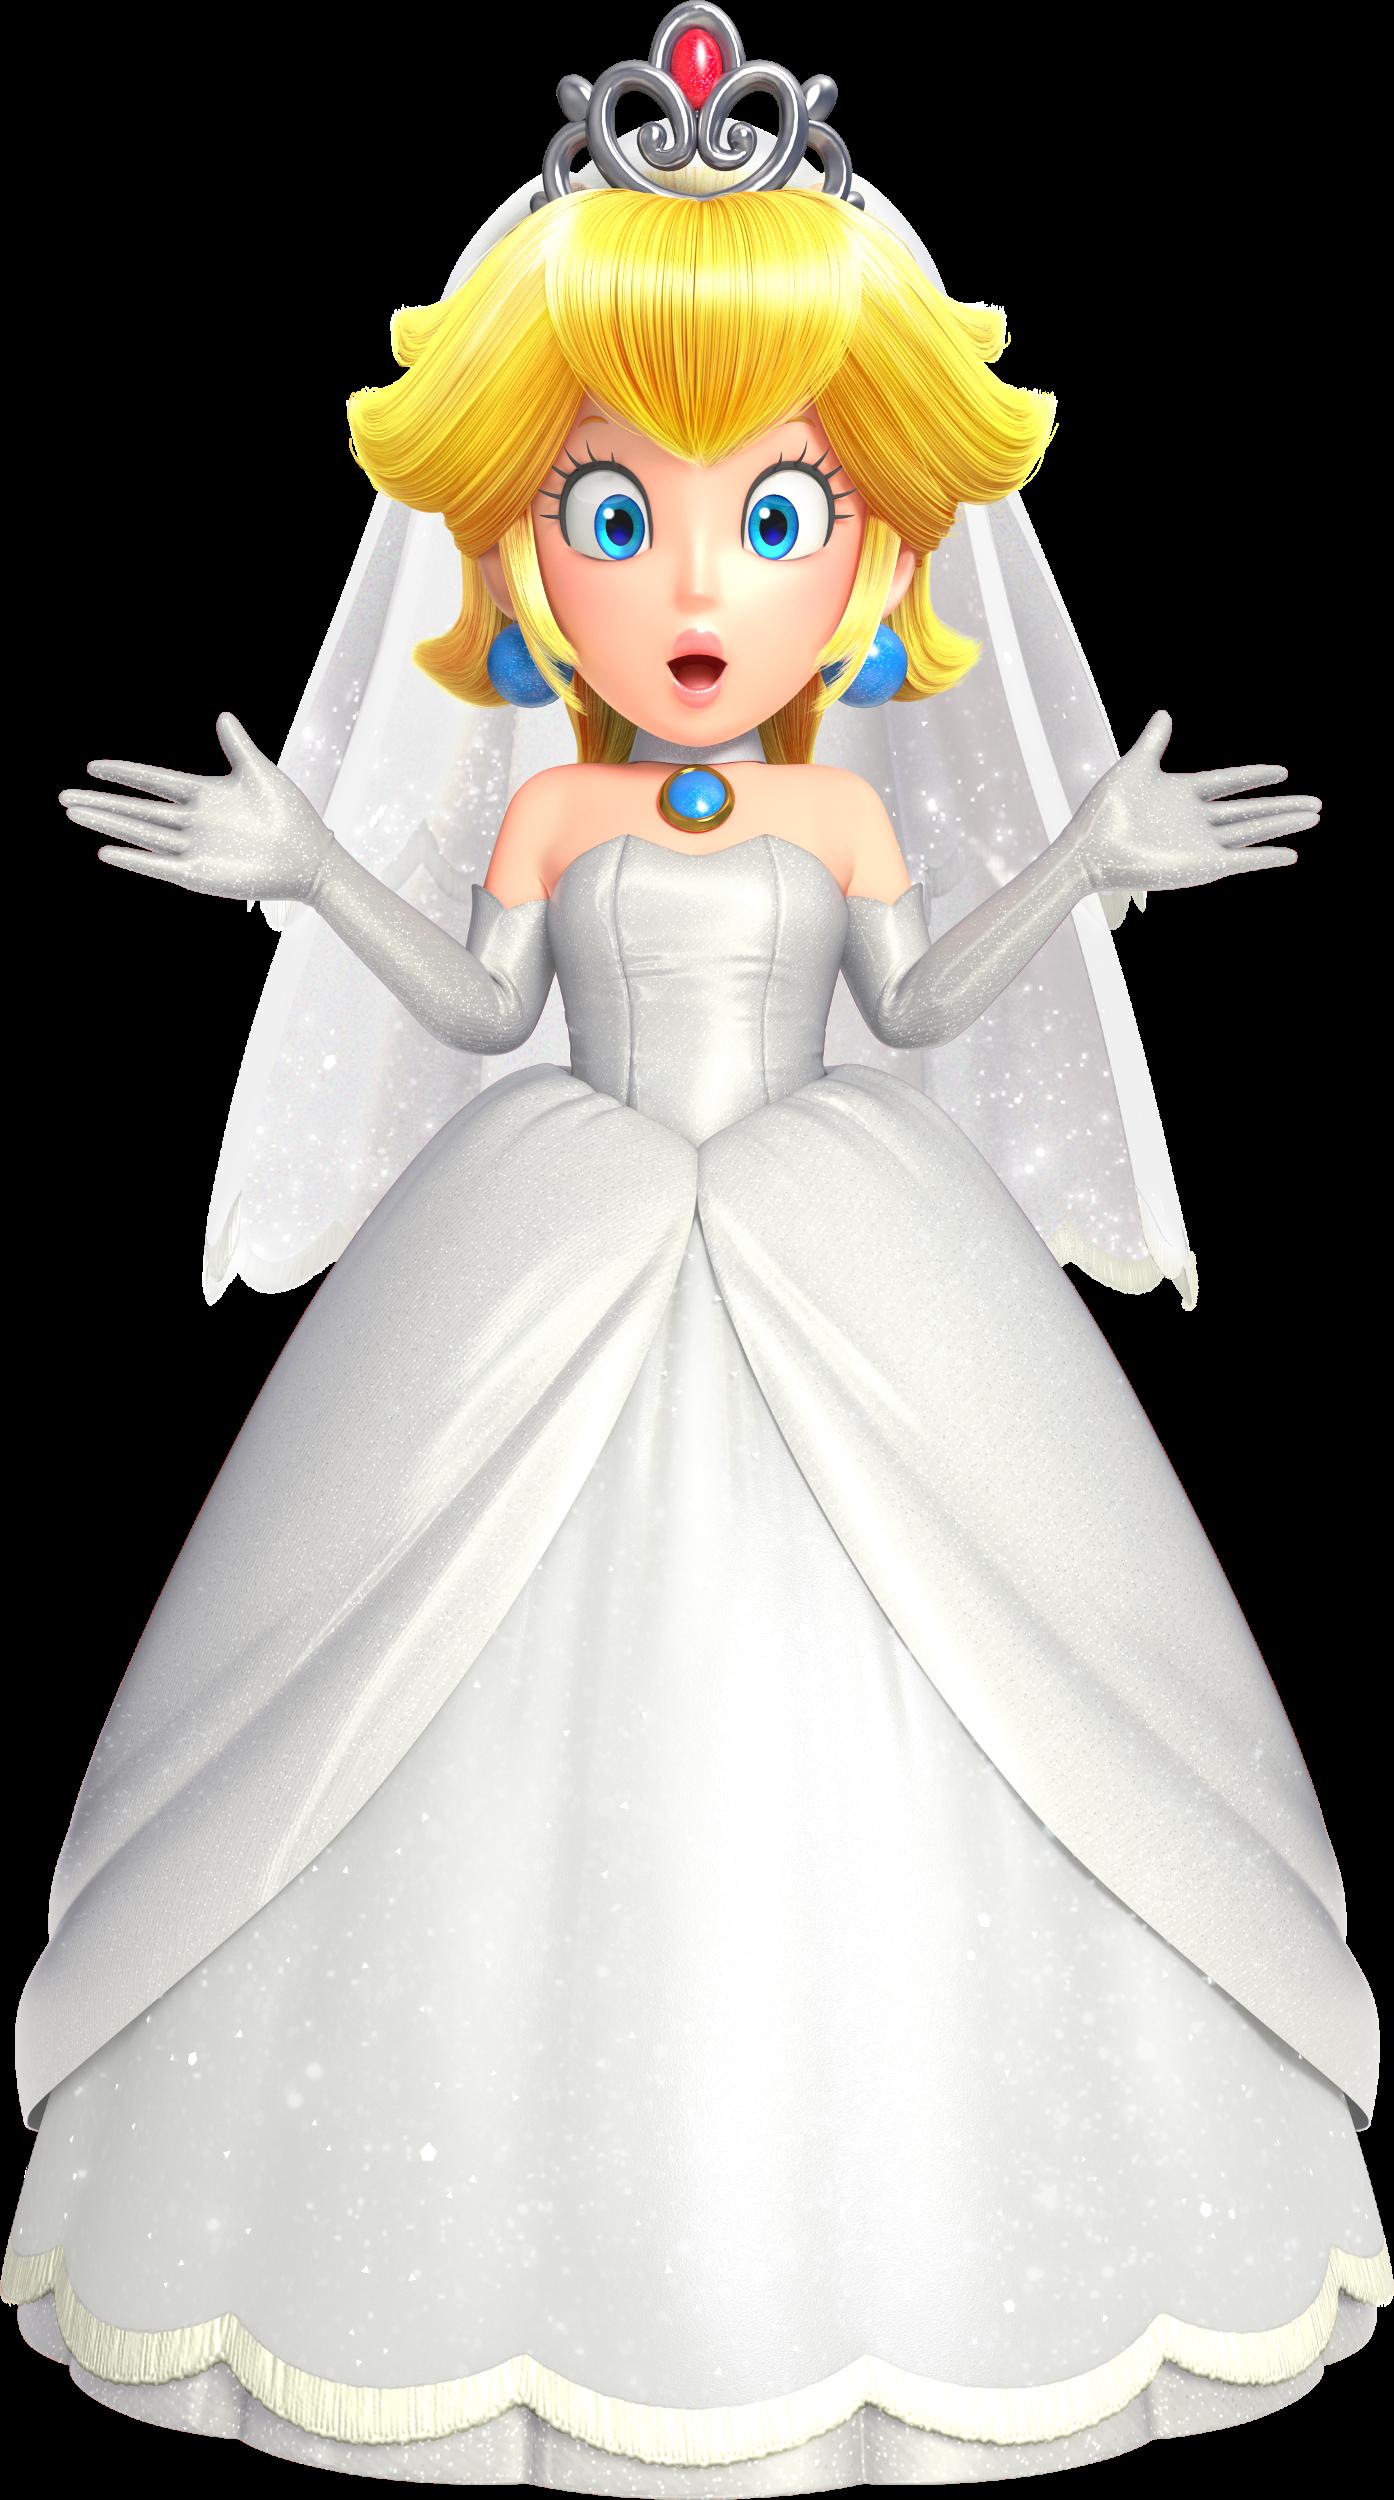 Wedding Peach Super Mario Odyssey Know Your Meme